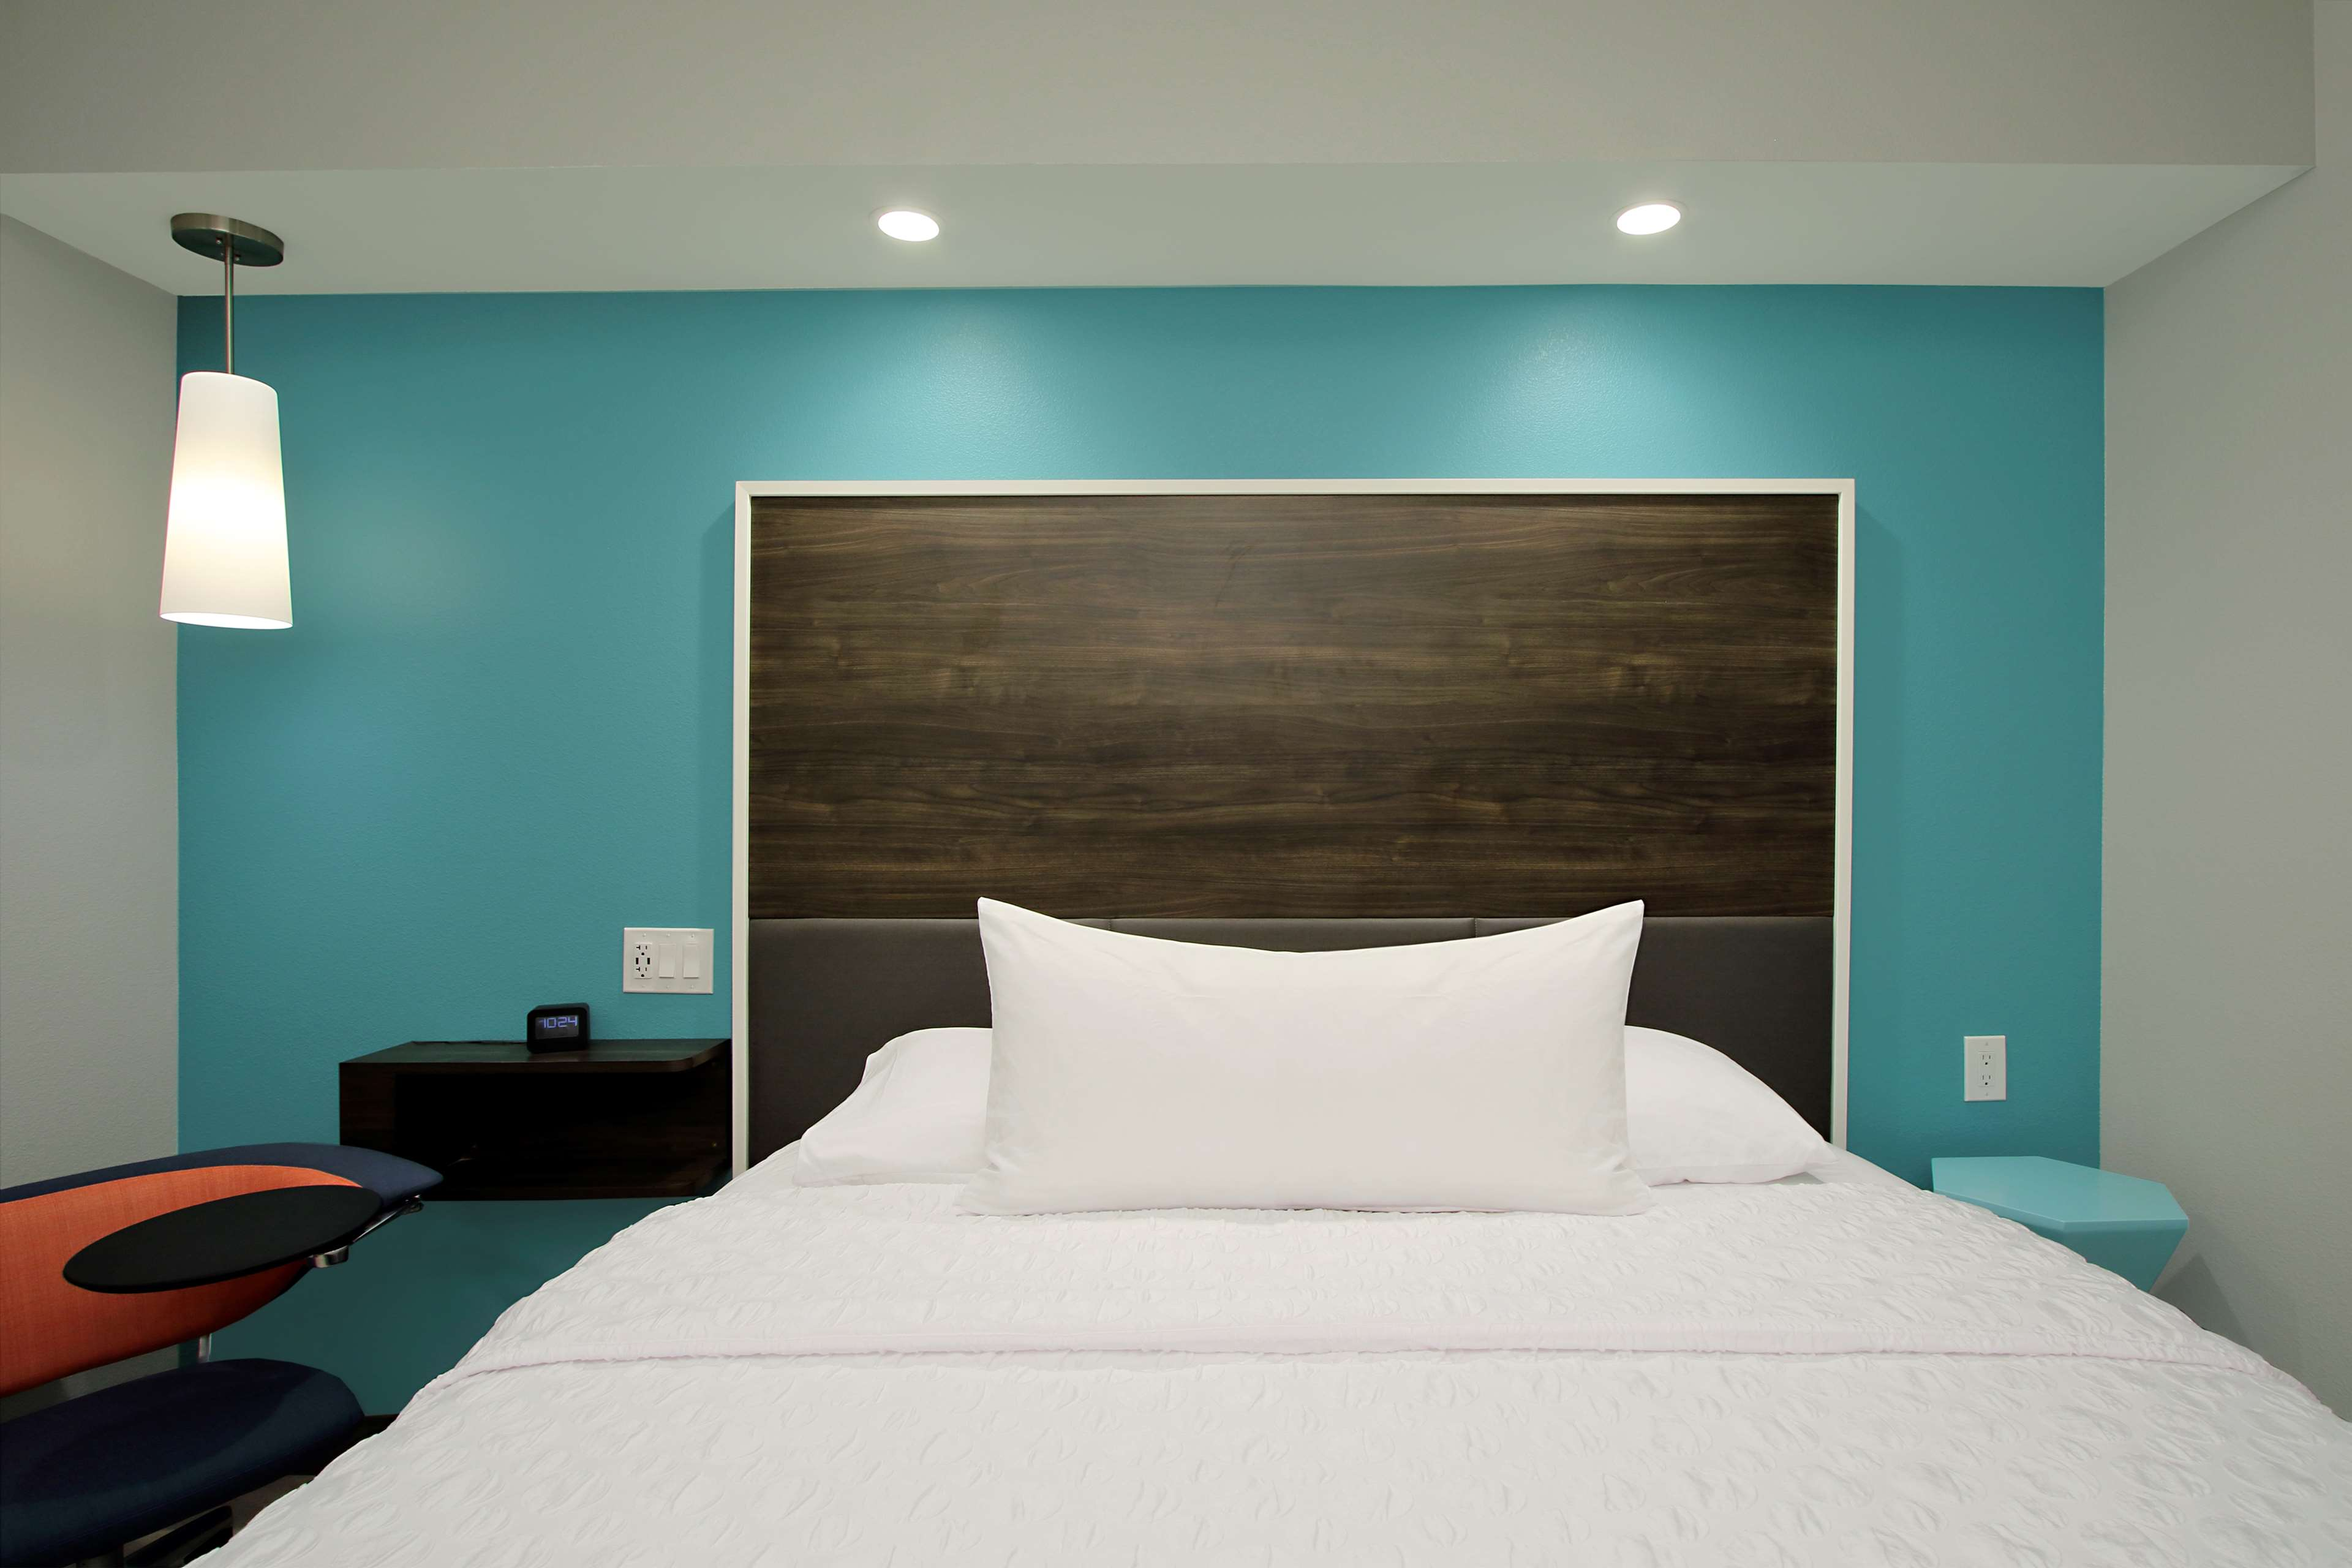 Tru by Hilton Meridian image 31